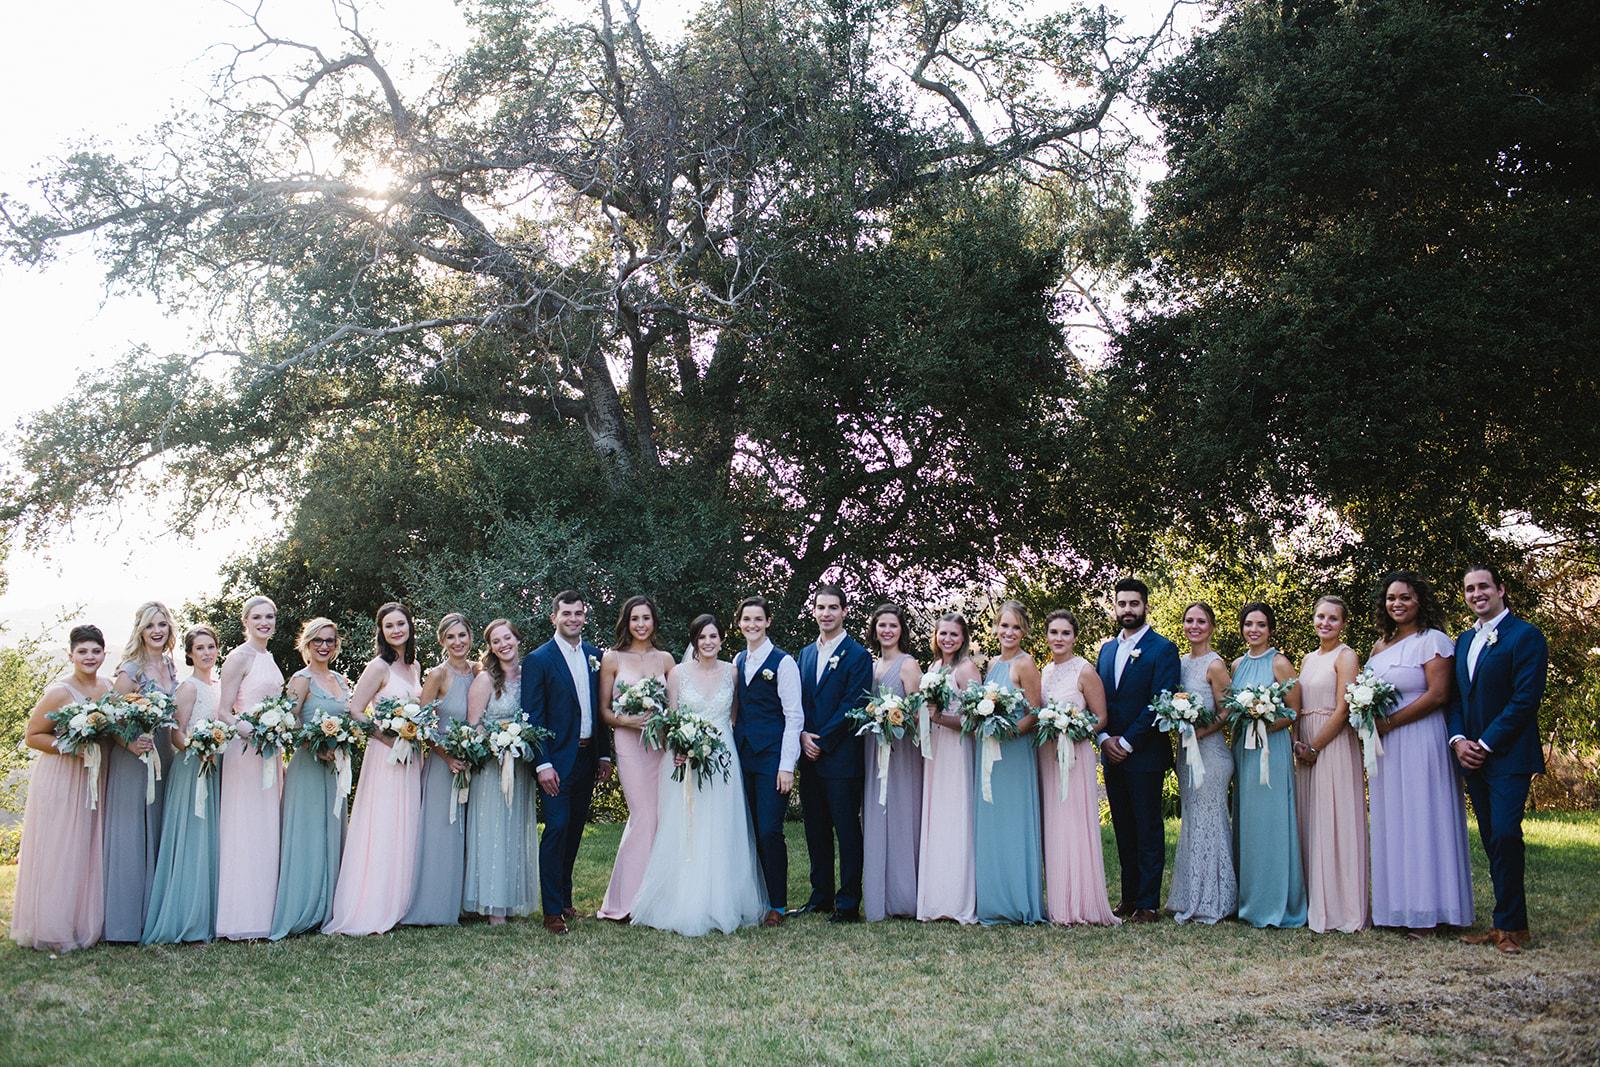 Large_Bridal_Party_Attire